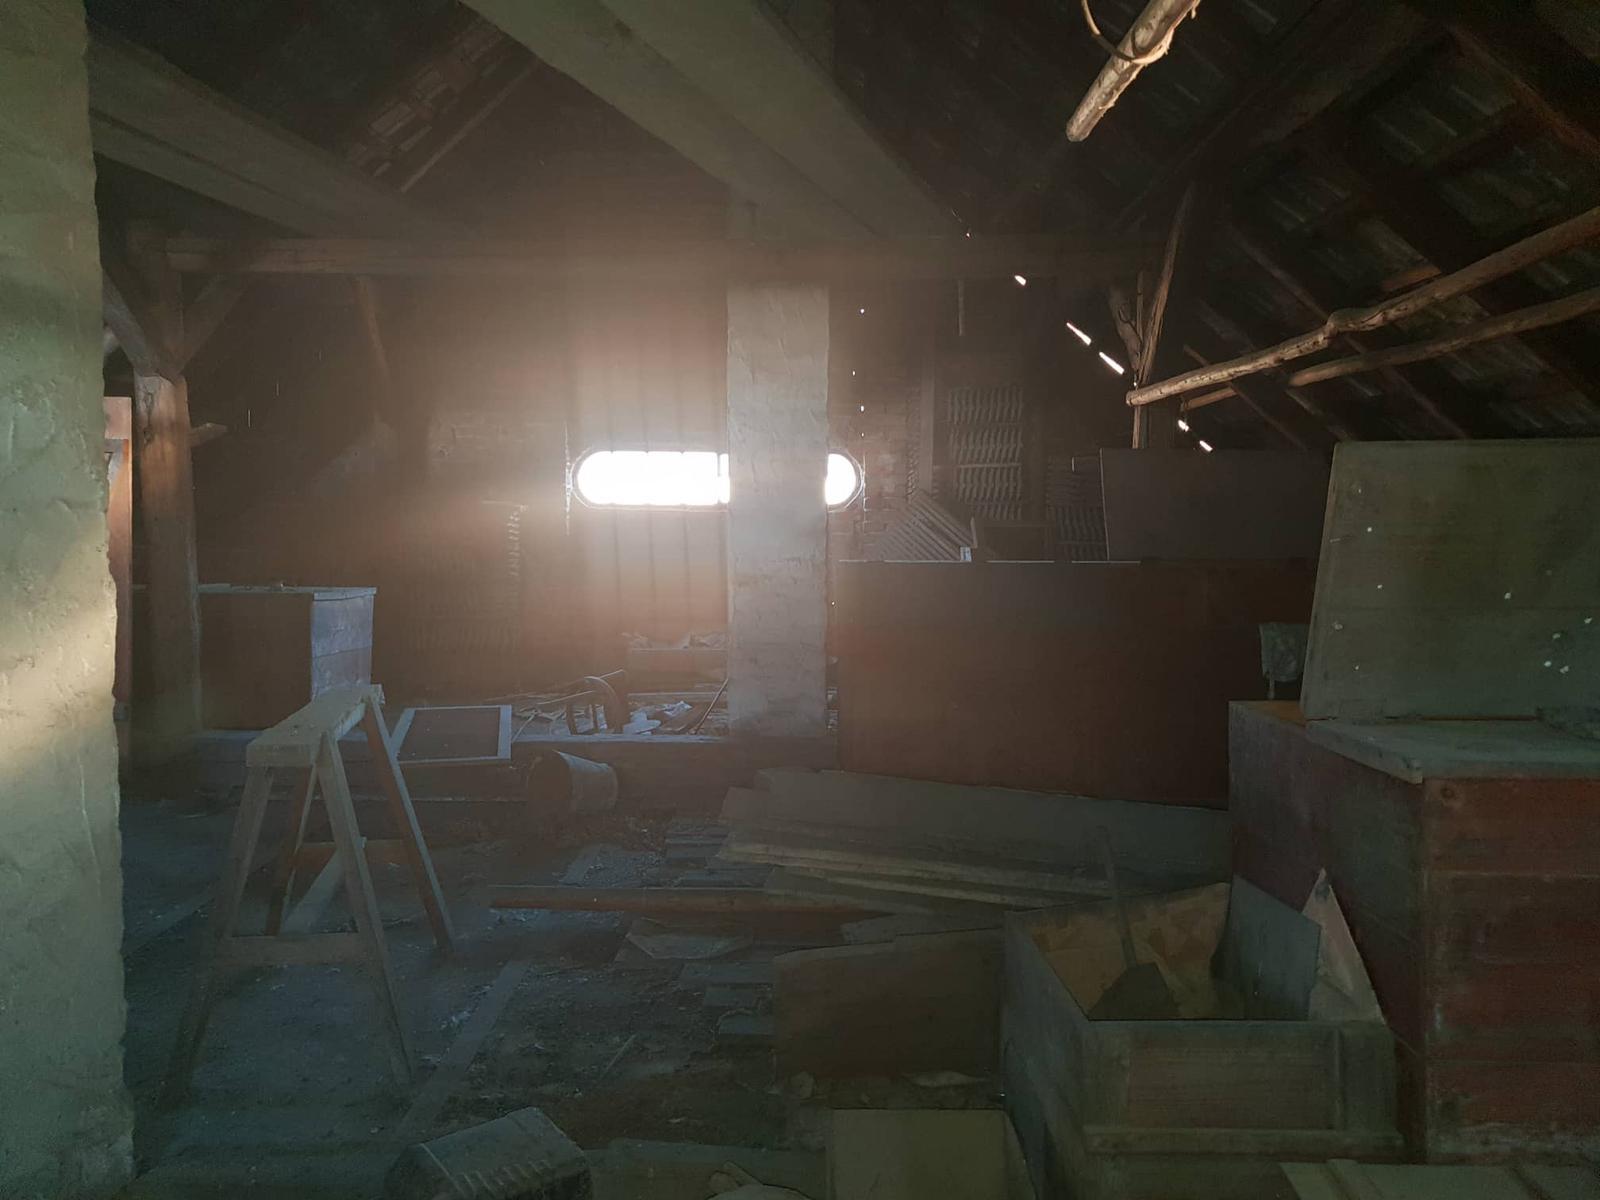 Rekonštrukcia domu-alebo chceme si splniť sen =》🏠🌻🌼🐶  mat domcek a vratit sa na Slovensko - pidi okno od suseda